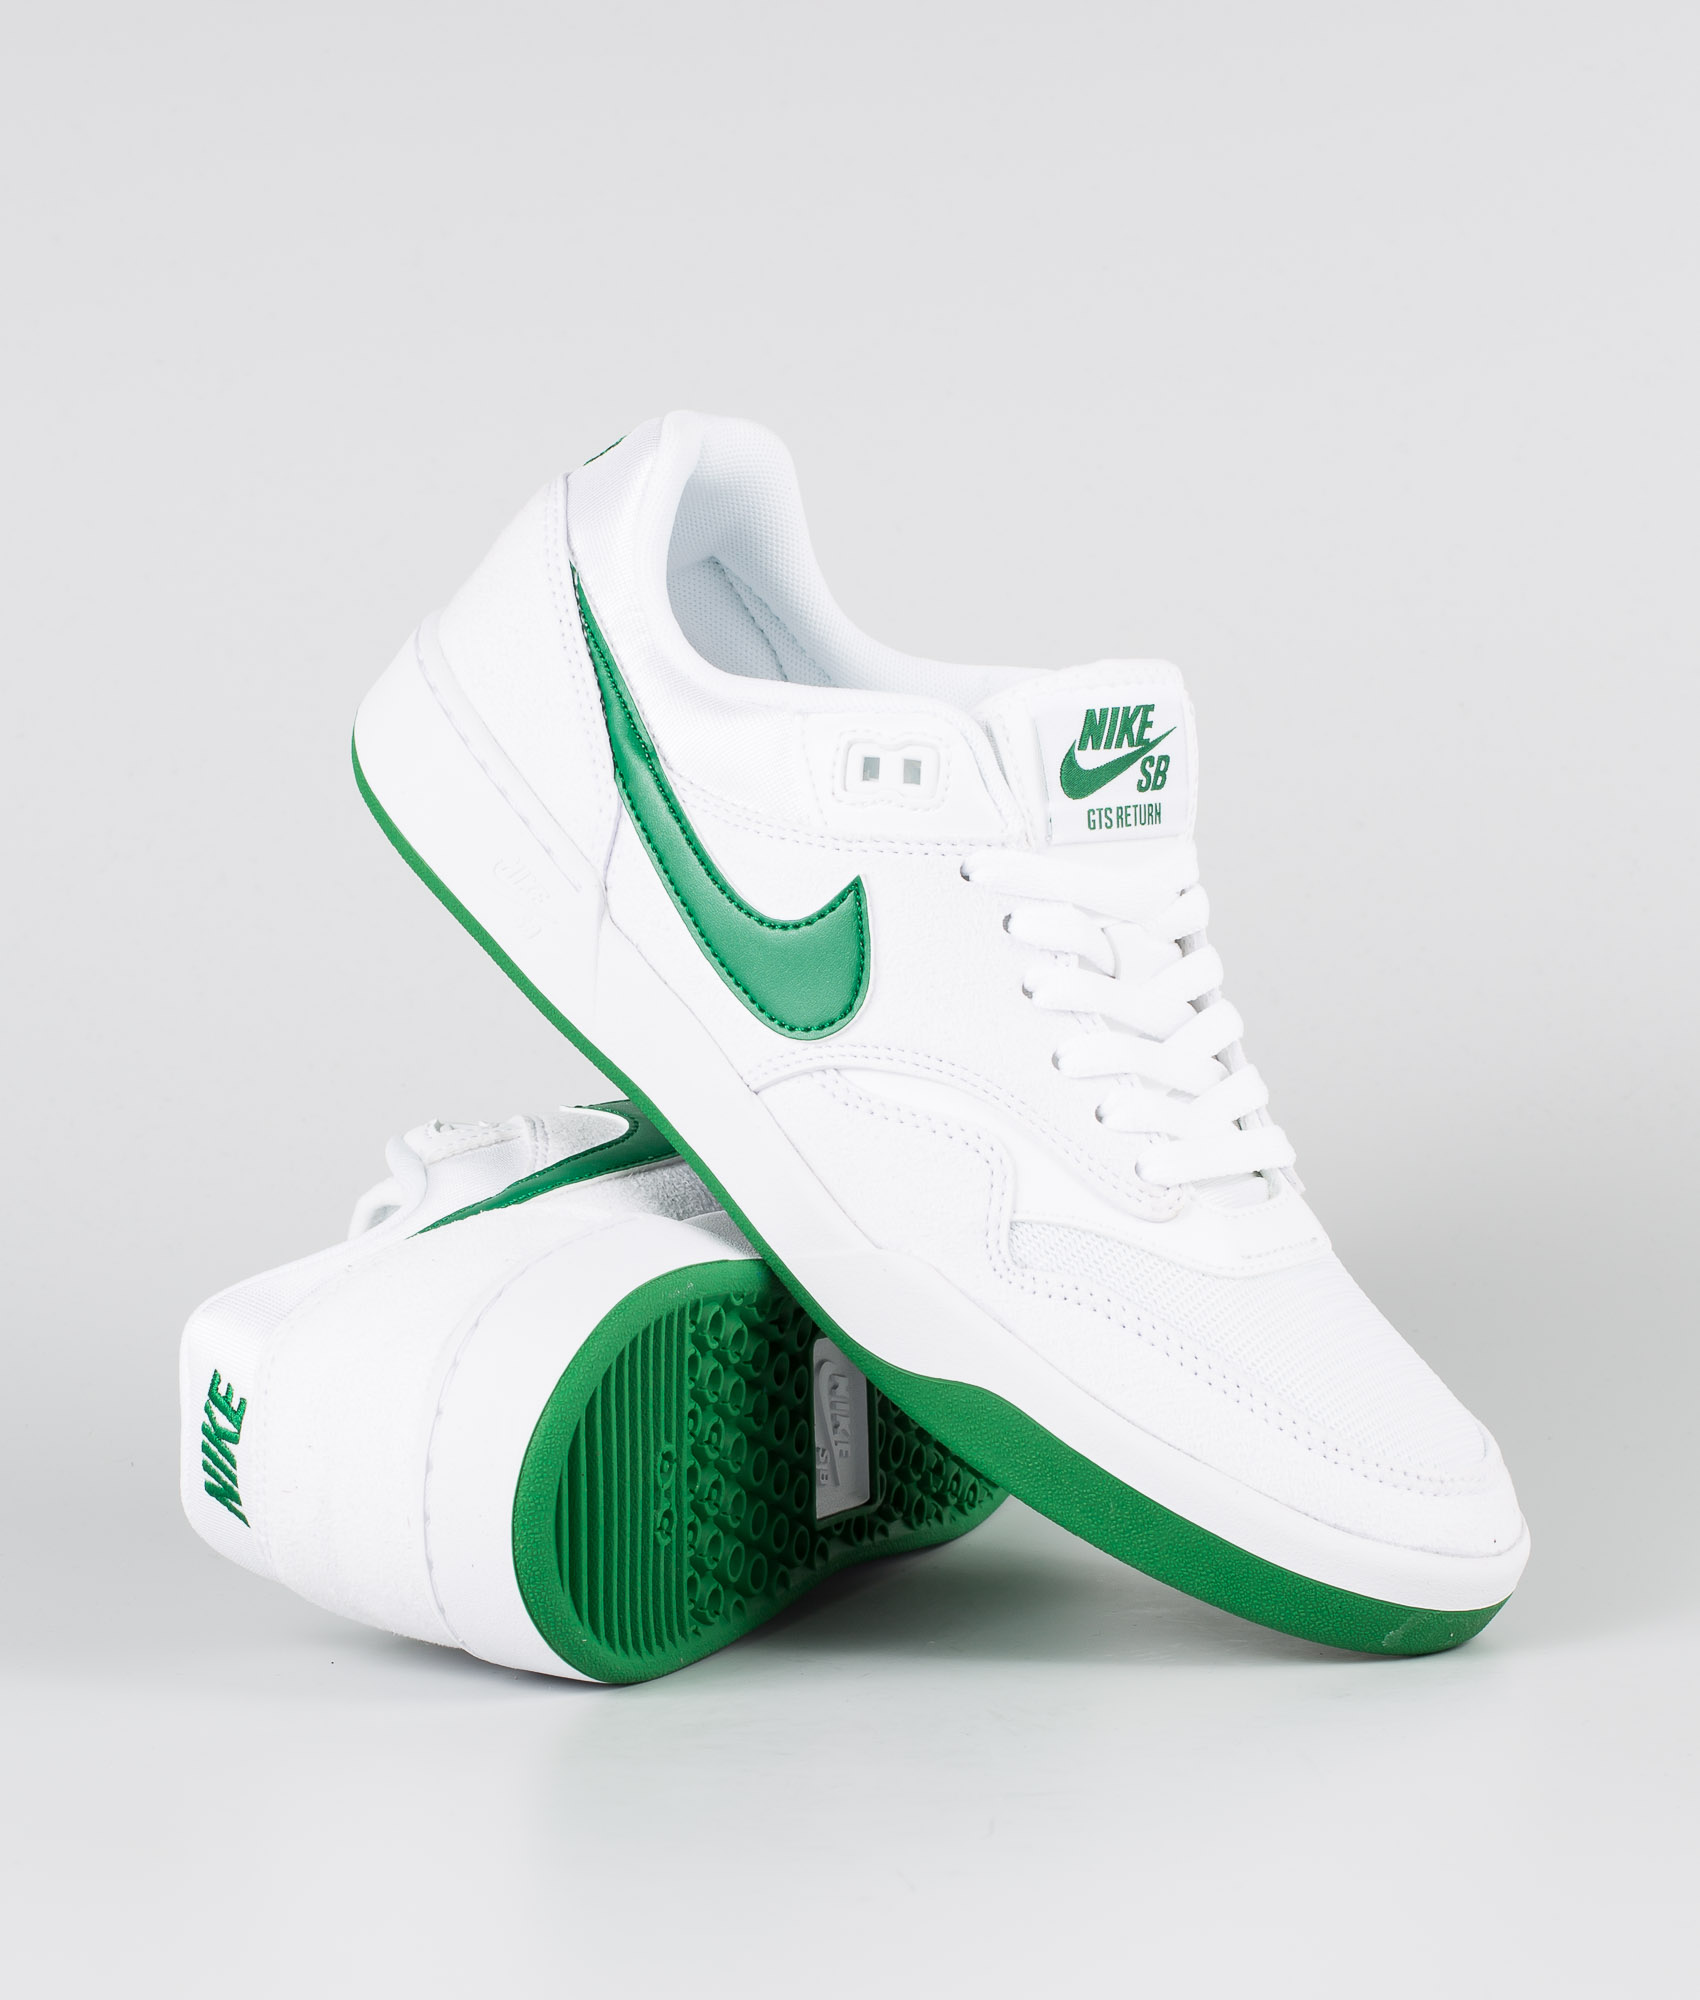 Nike SB GTS Return Shoes White/Pine